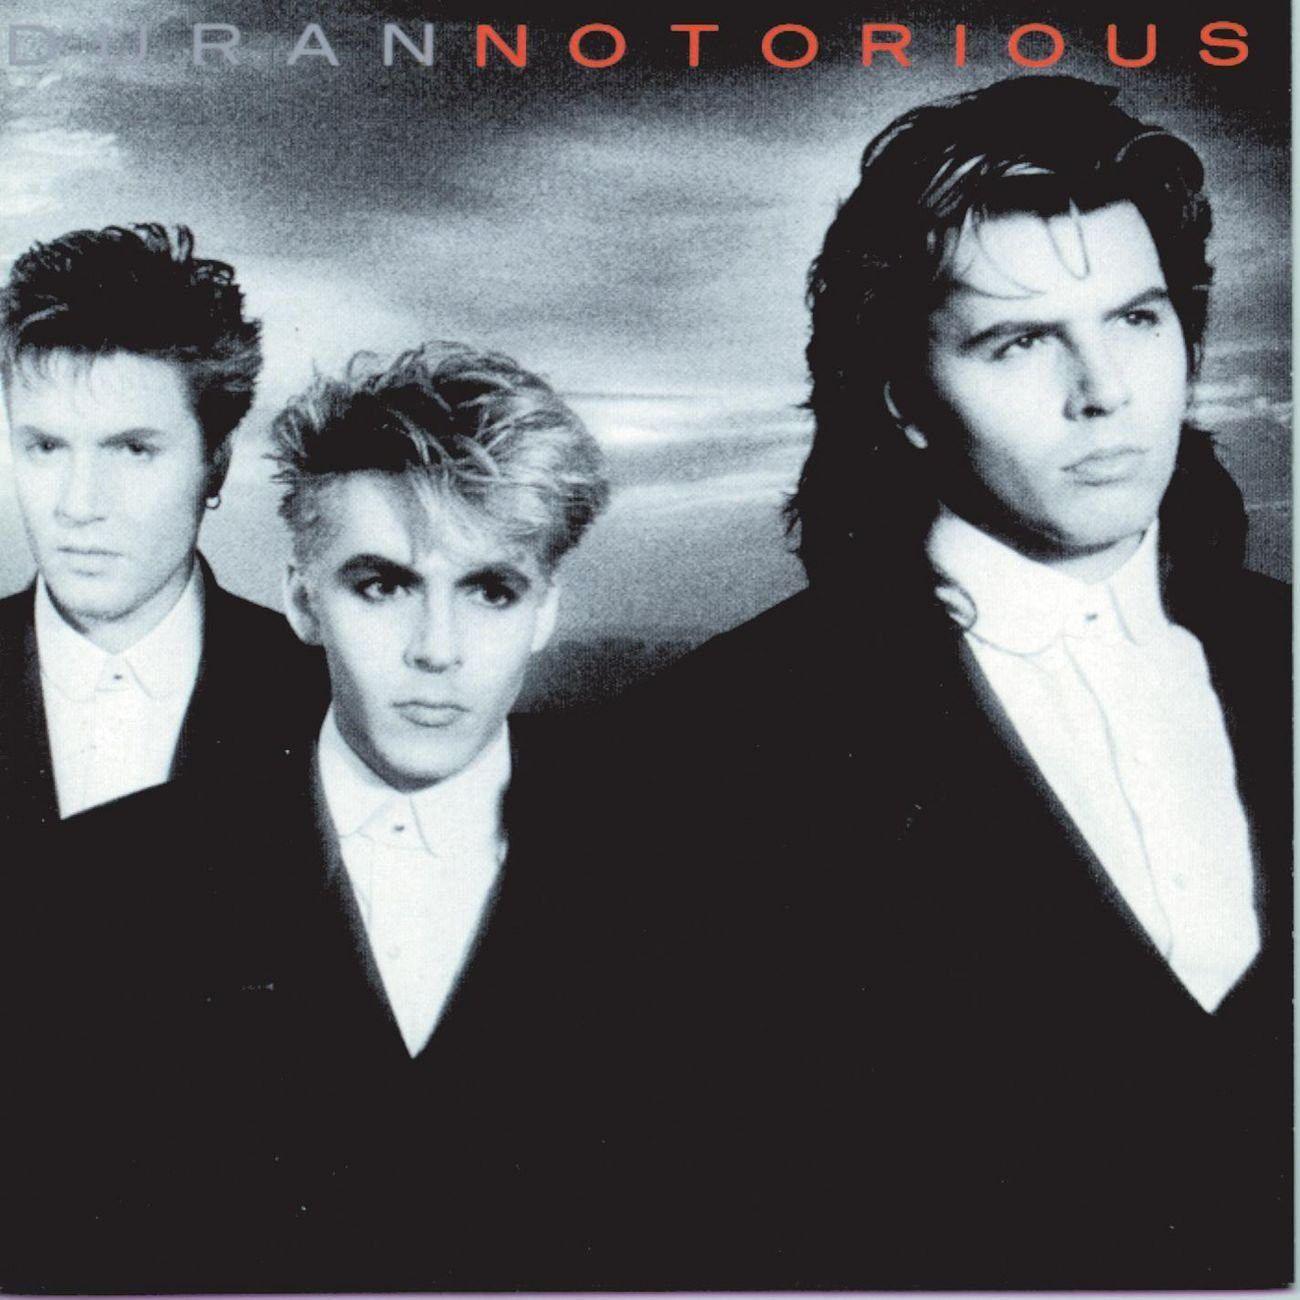 Duran Duran Notorious Duran Duran Albums Music Album Covers